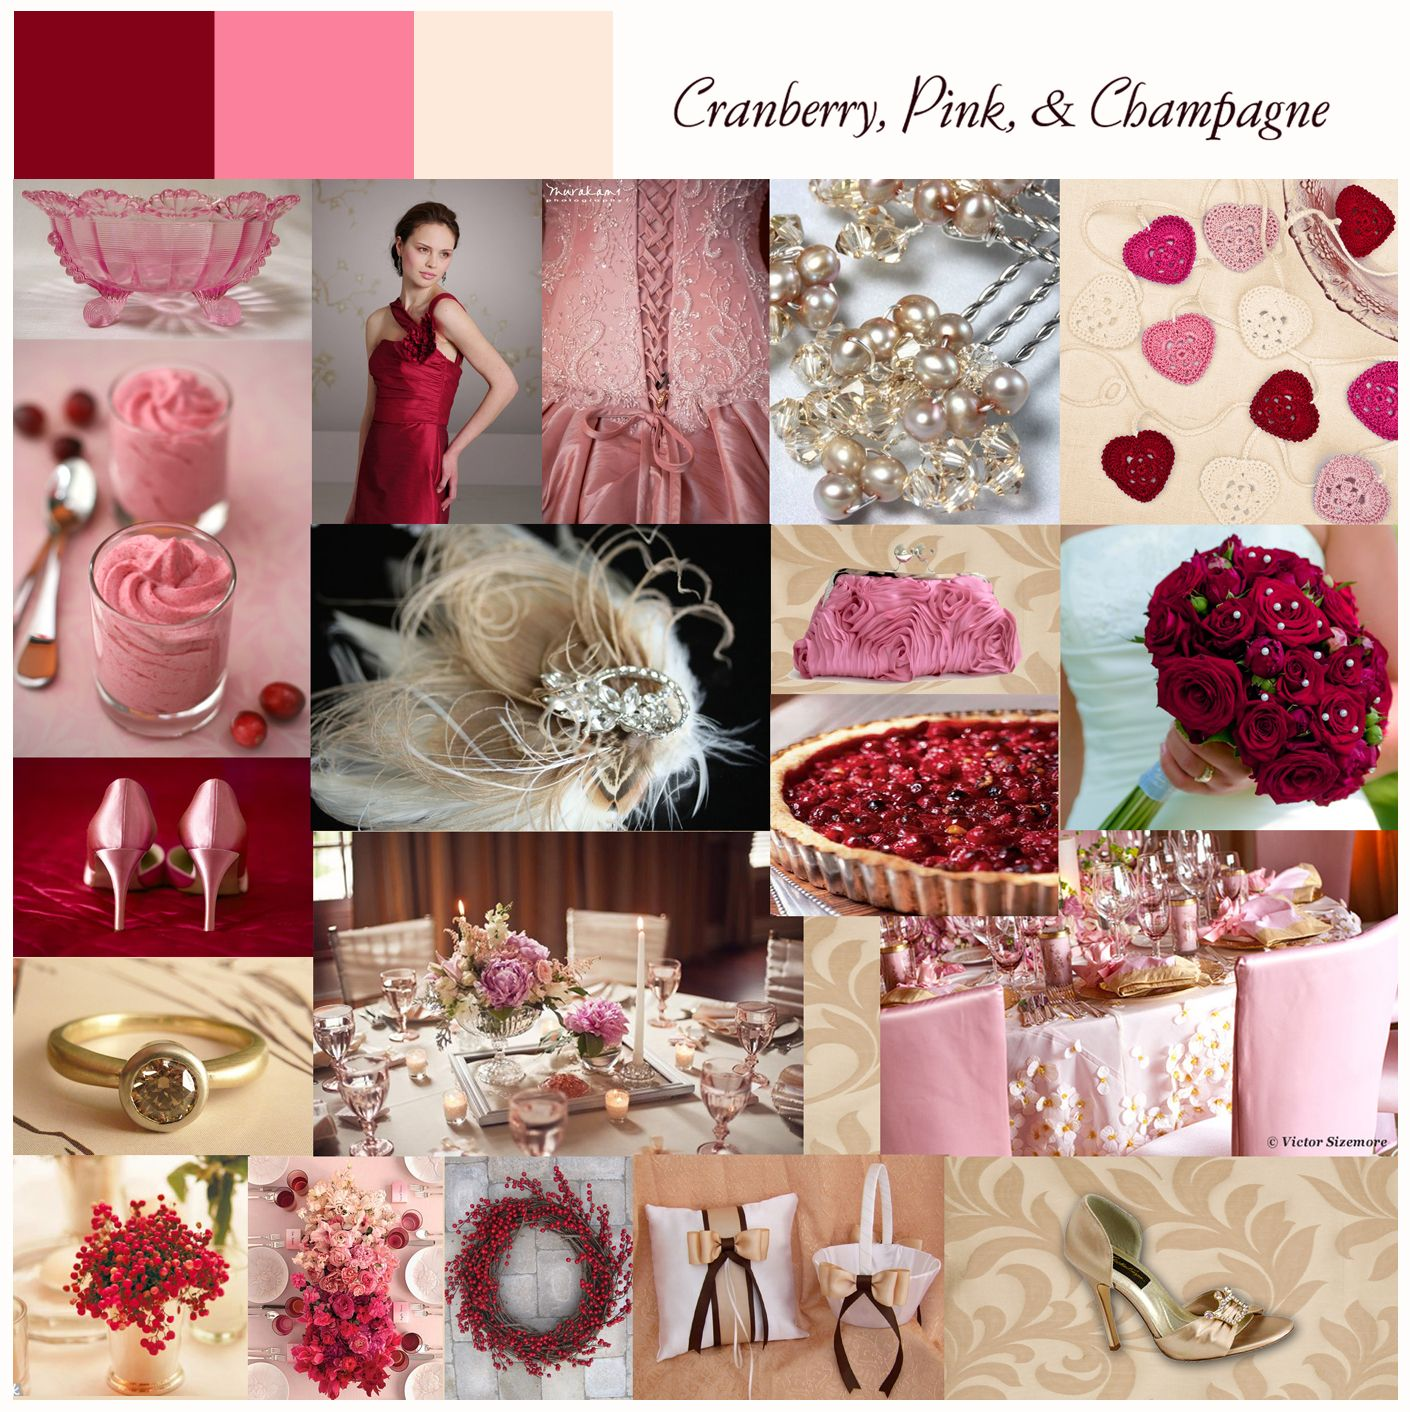 Cranberry champagne wedding - Champagne Cranberry Wedding